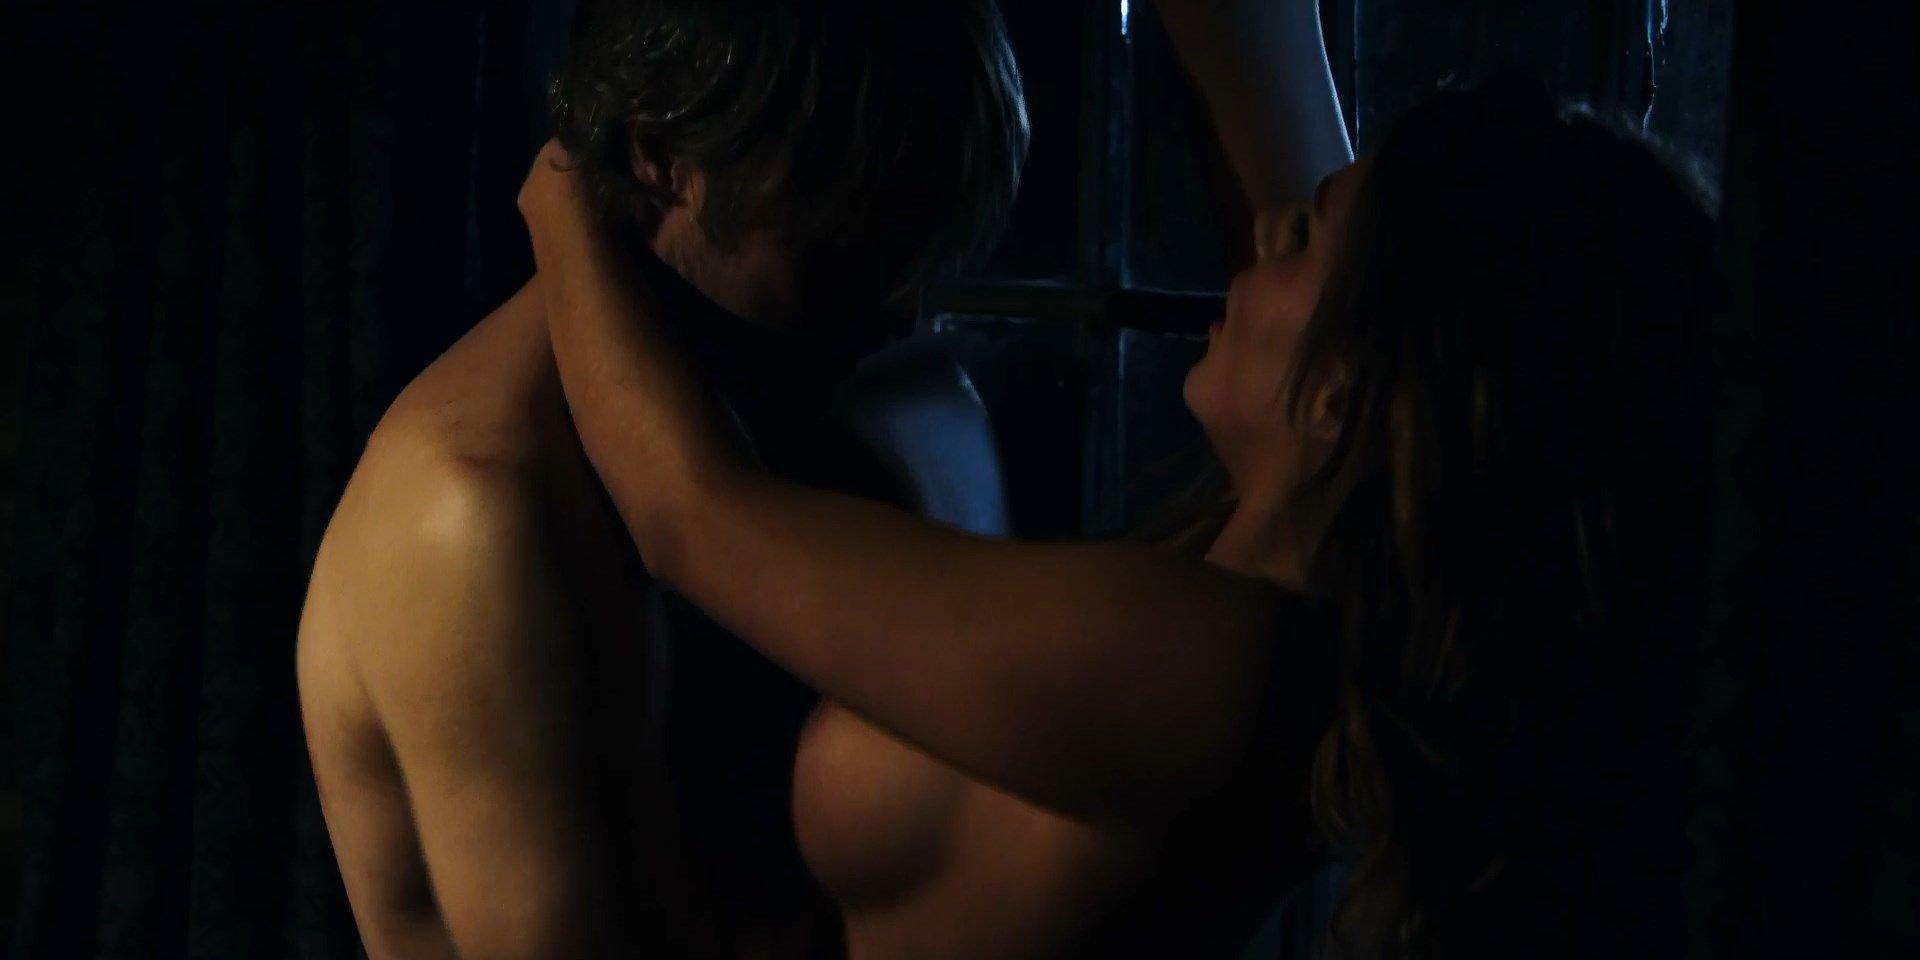 Boobs Vanessa Hudgens Naked Scene Pictures